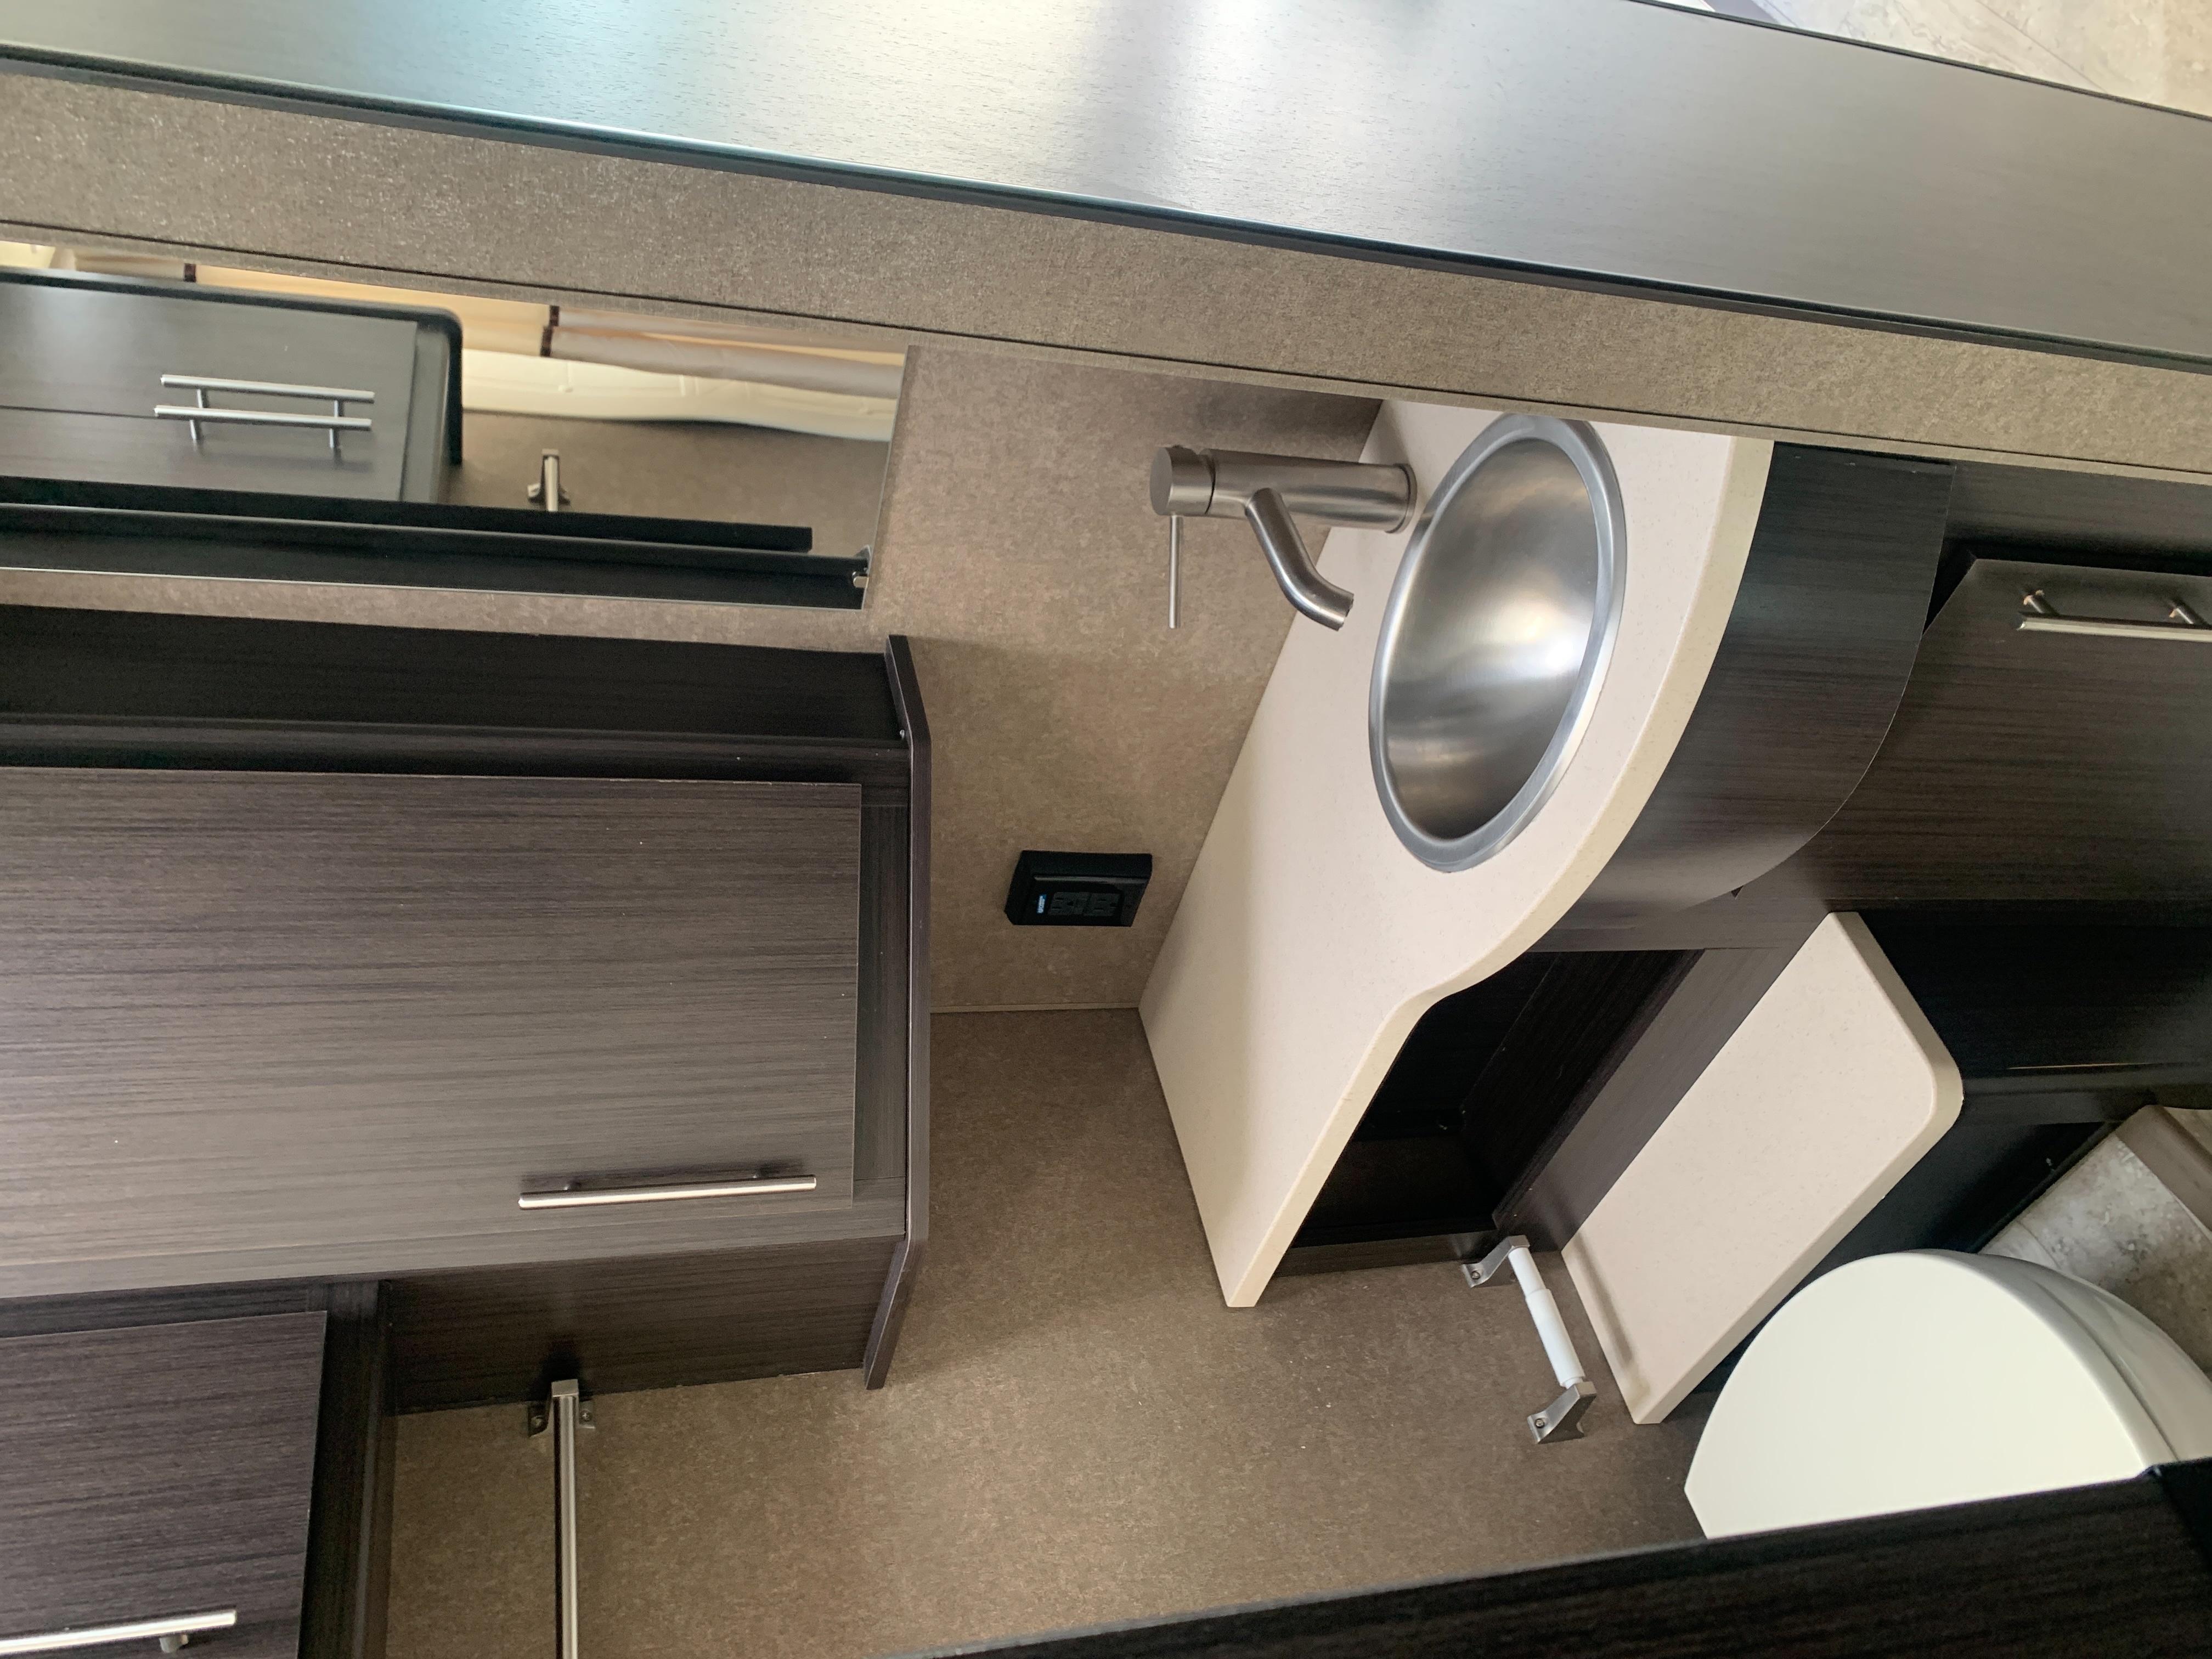 2018 Thor Motor Coach Vegas RUV 25.2 at Prosser's Premium RV Outlet